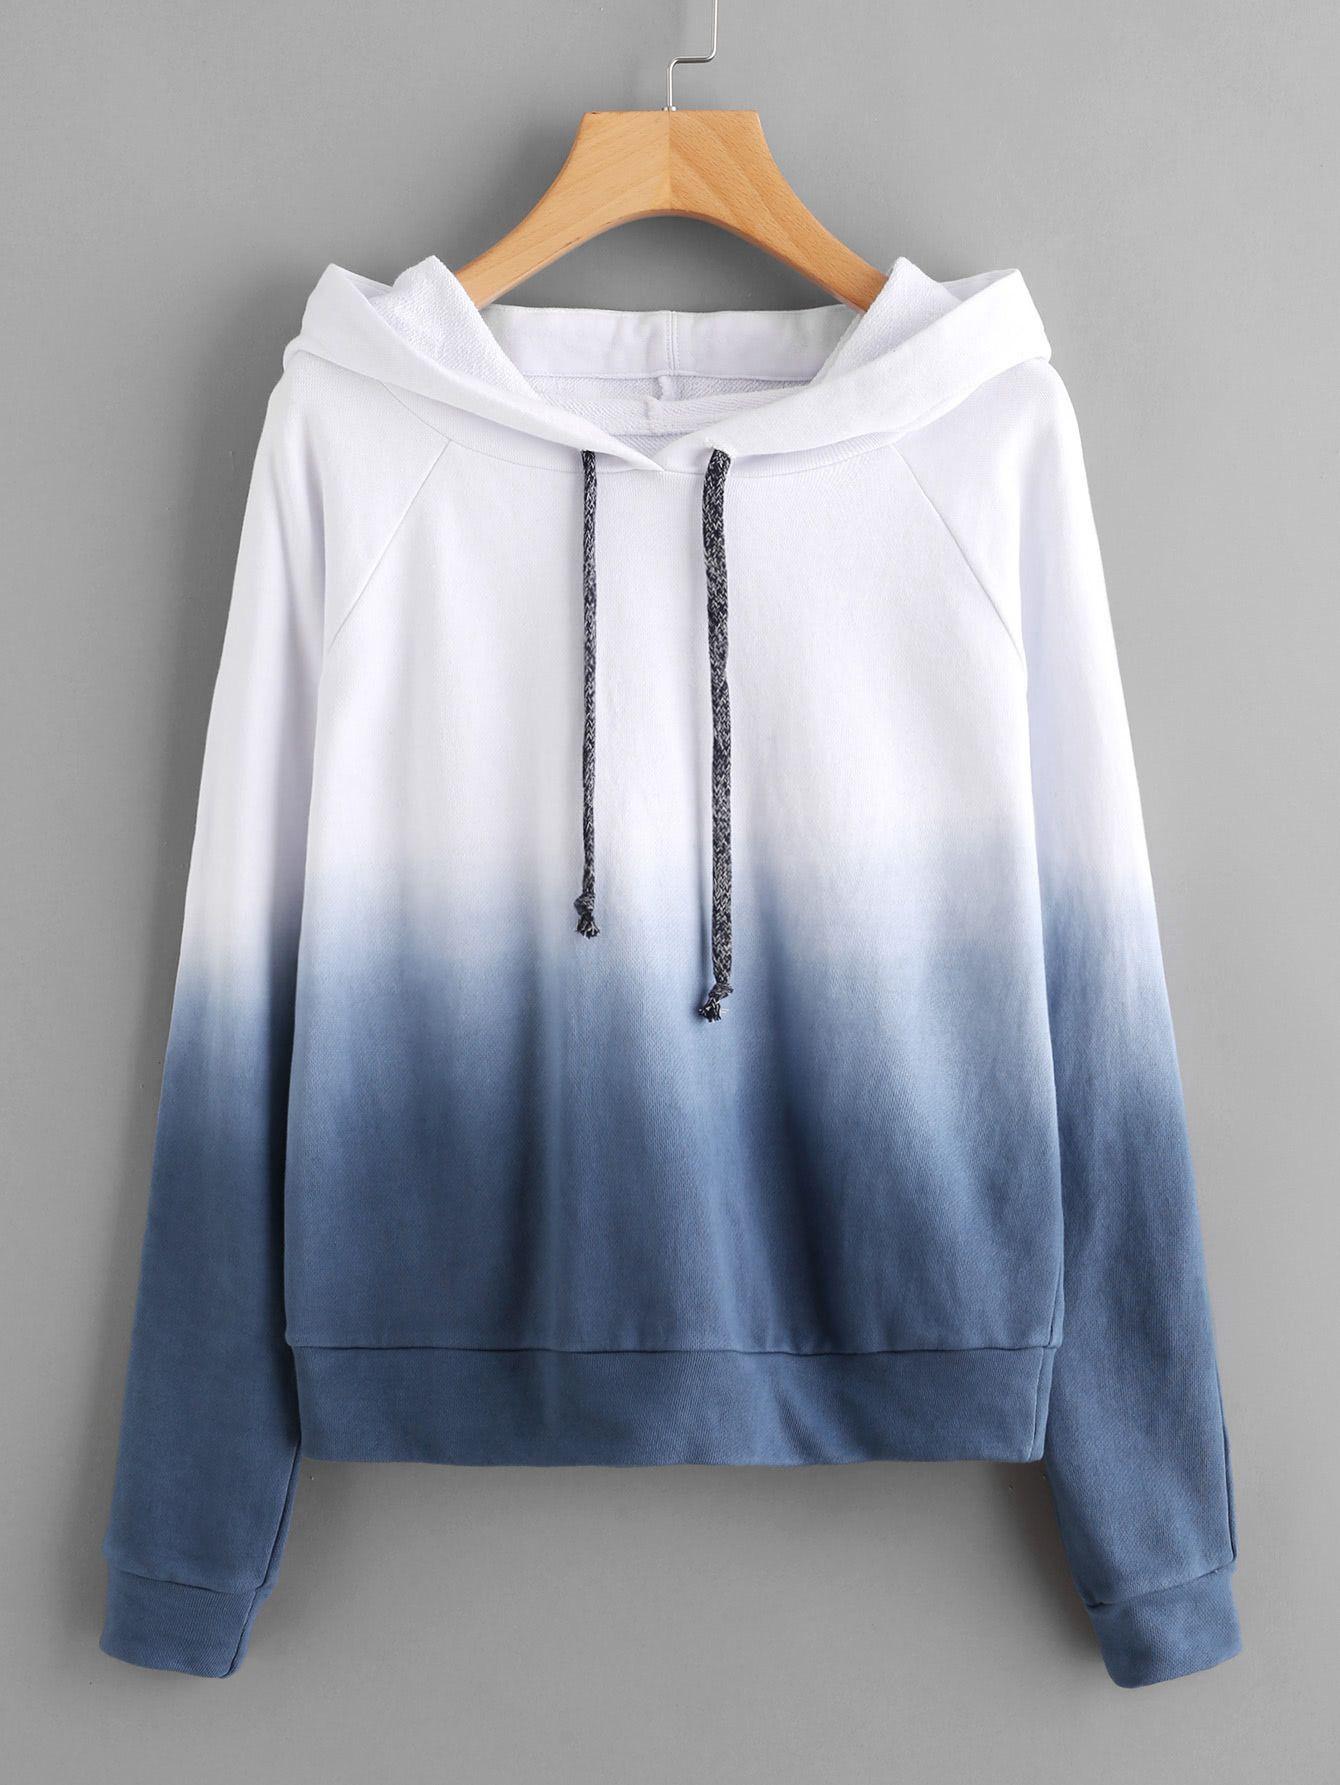 Shop Raglan Sleeve Ombre Hoo online SheIn offers Raglan Sleeve